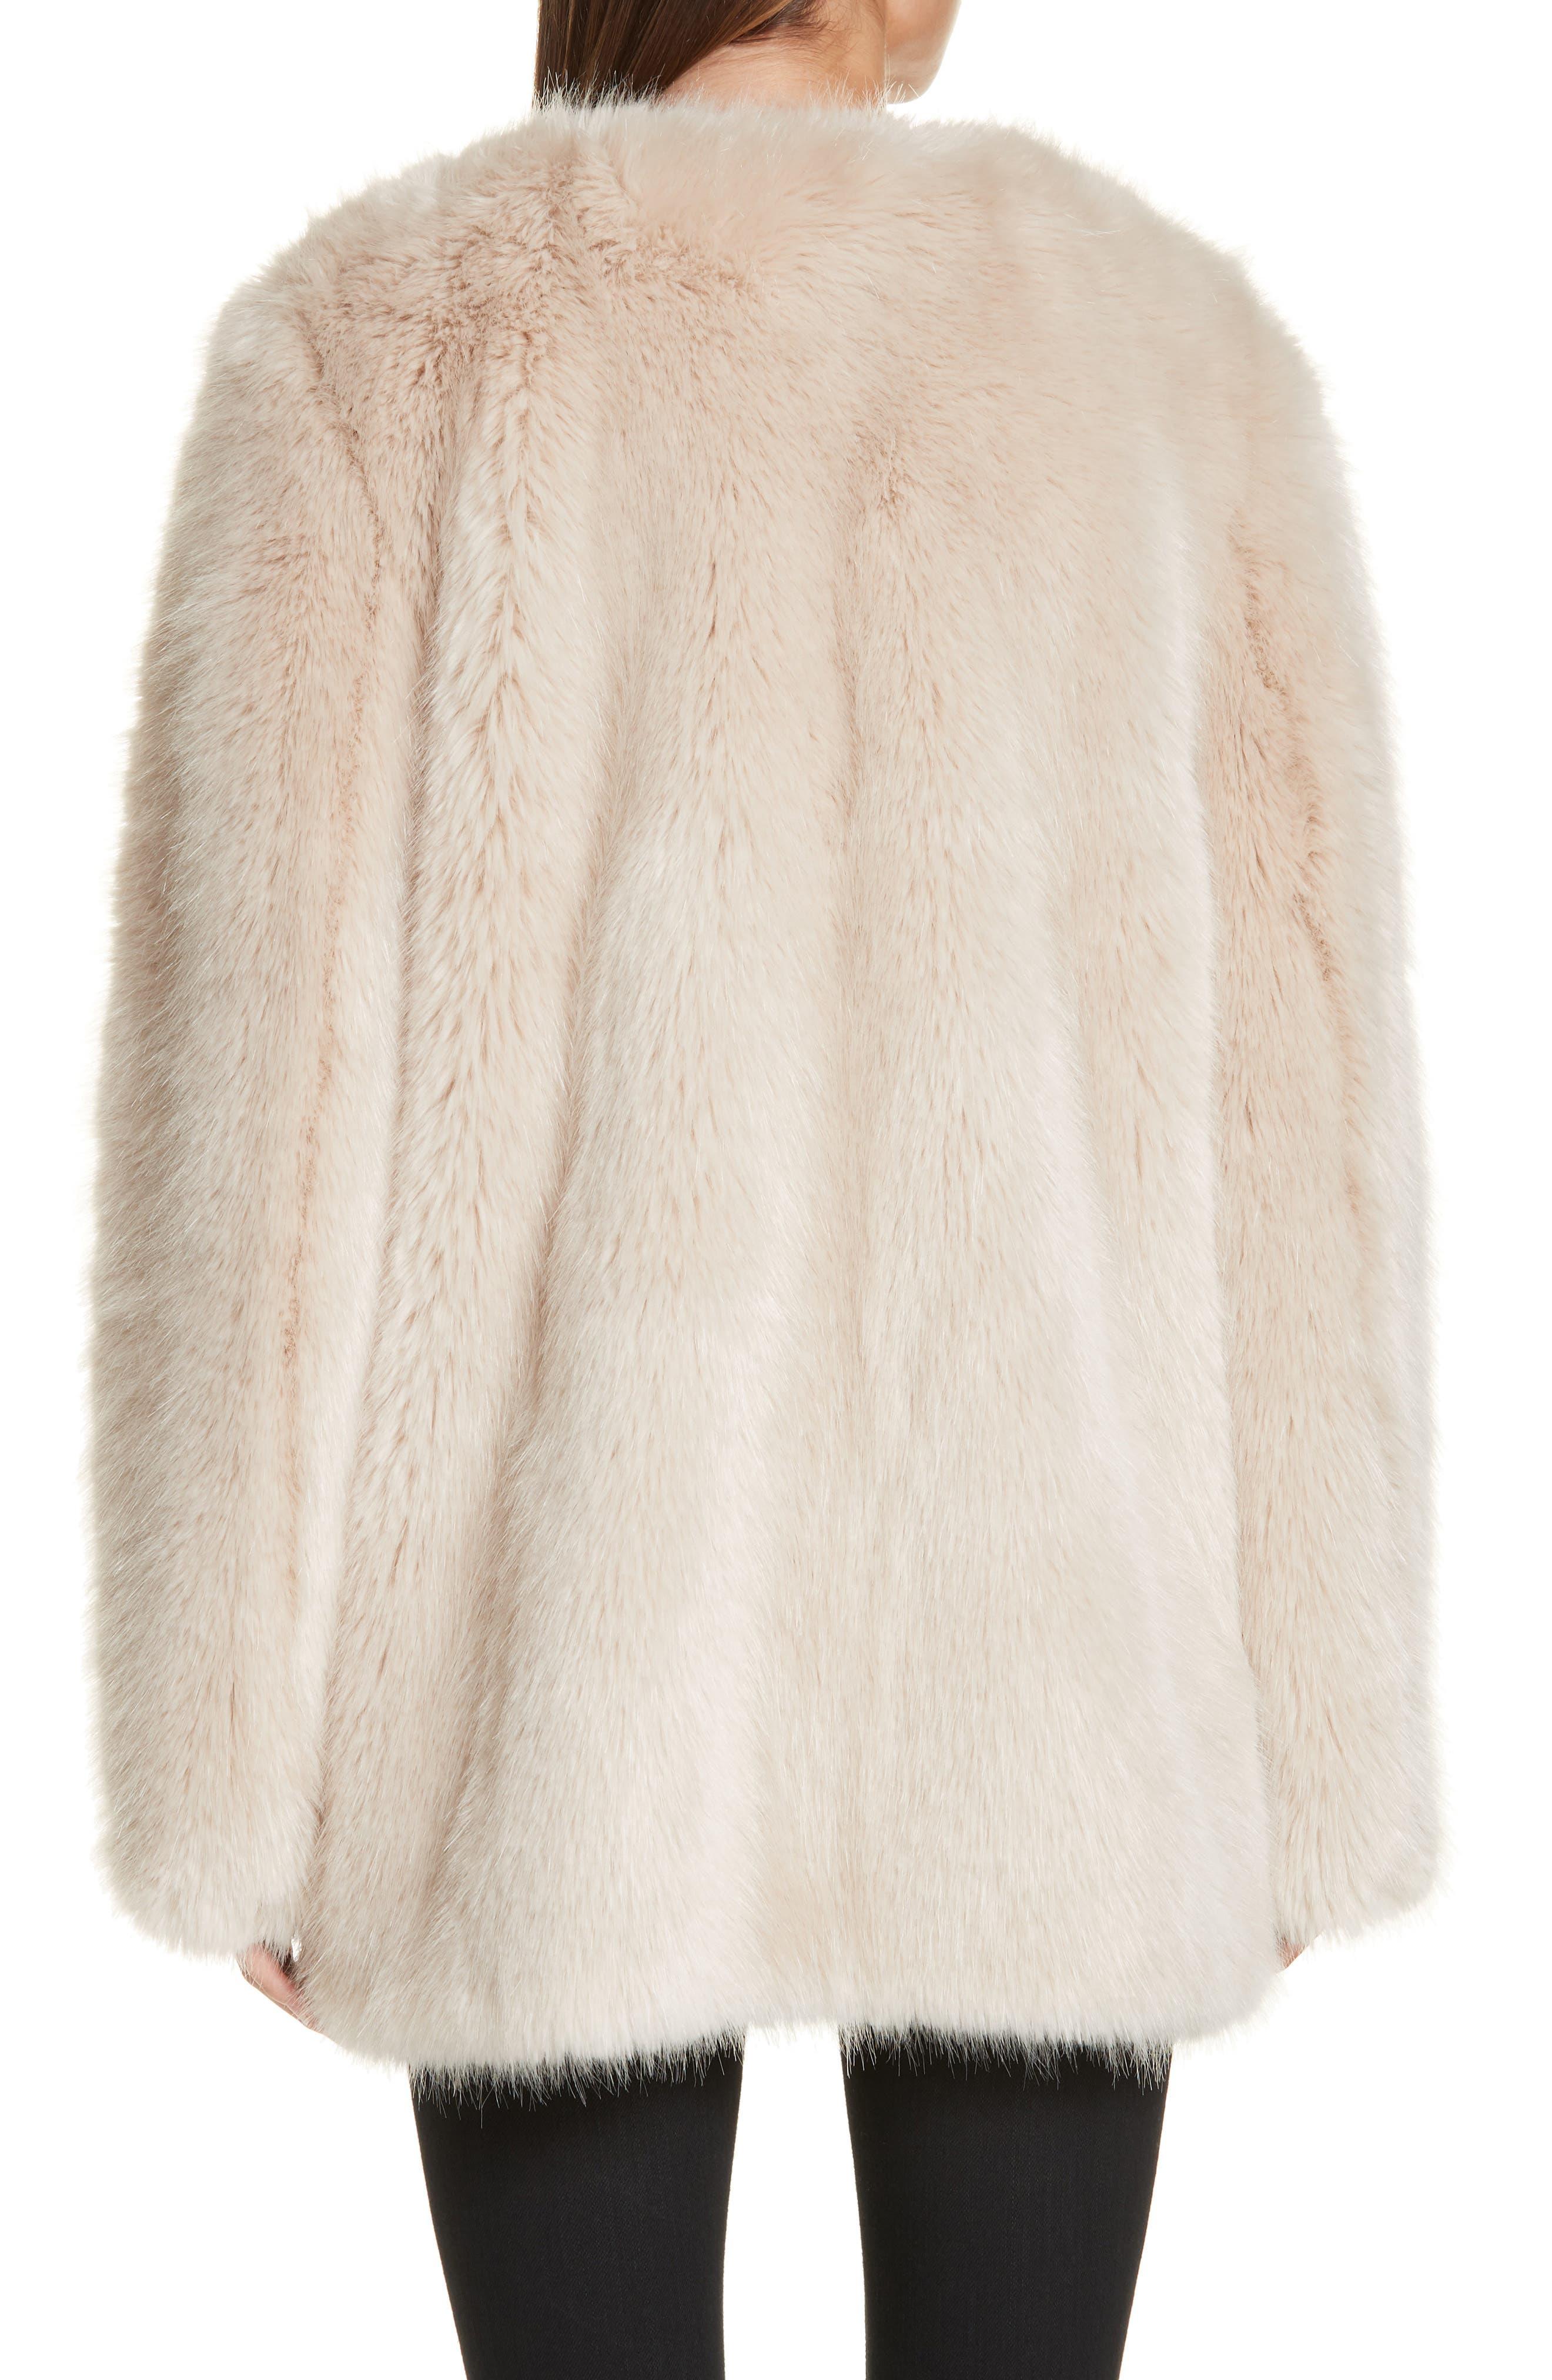 HELMUT LANG, Faux Fur Coat, Alternate thumbnail 2, color, OATMEAL